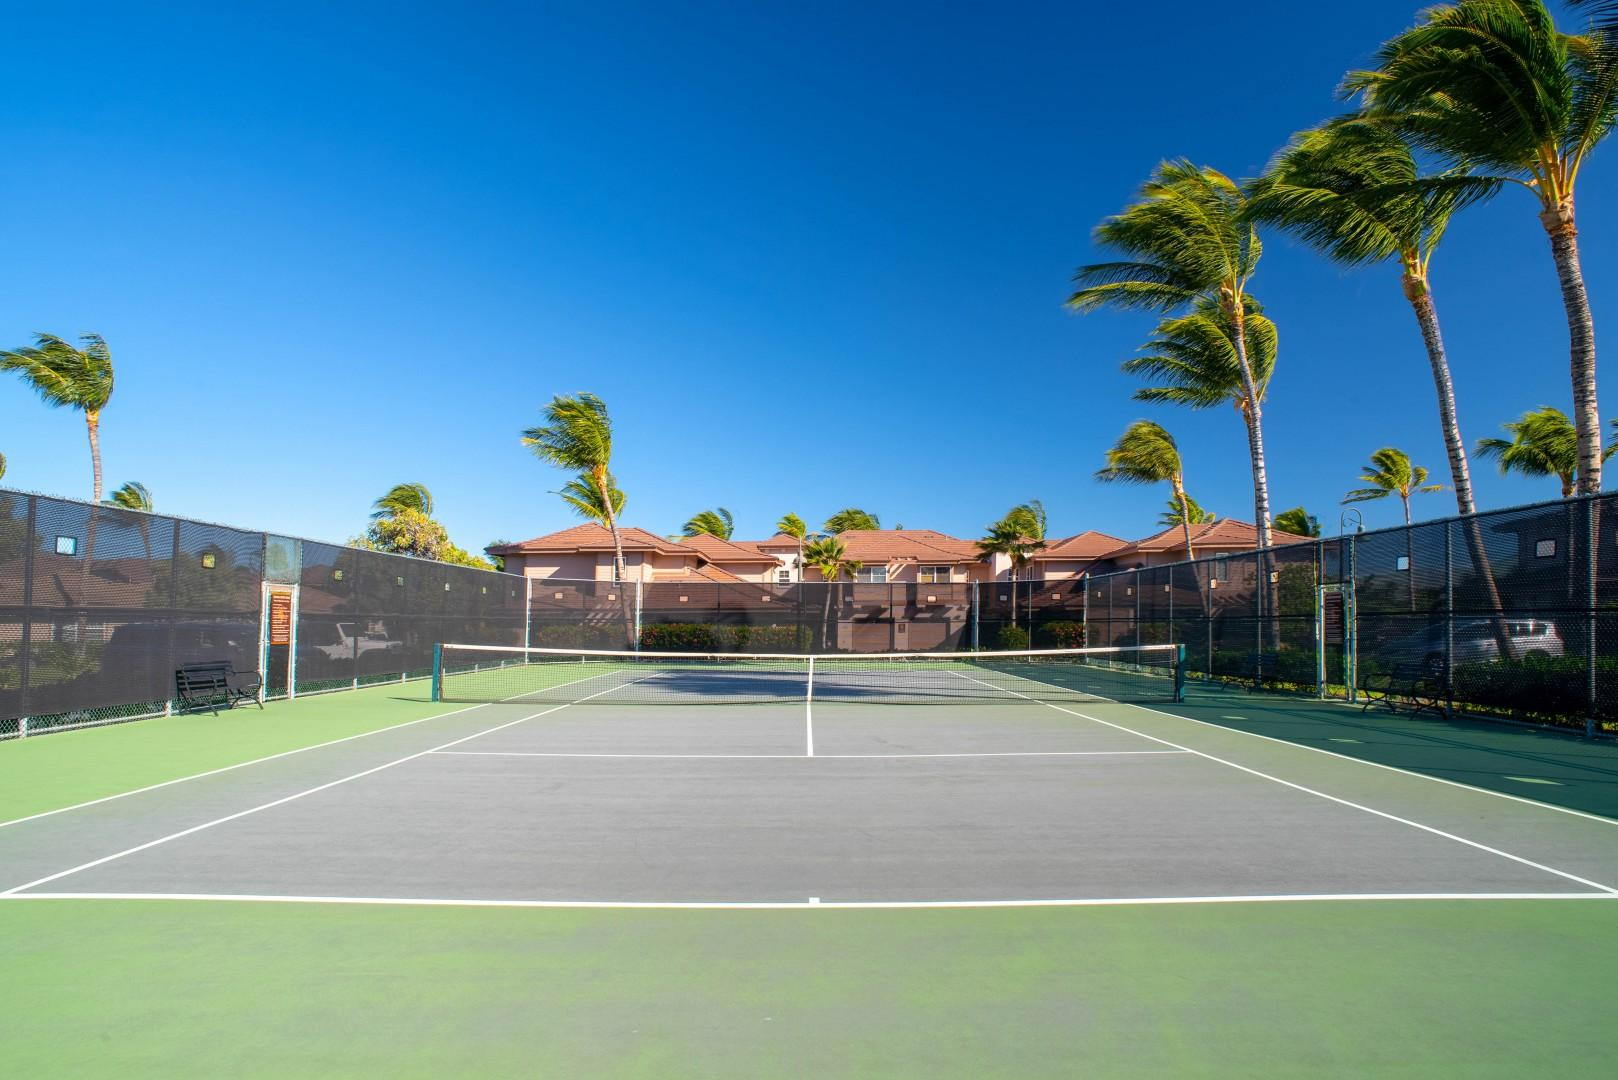 Alternate View of Tennis Court